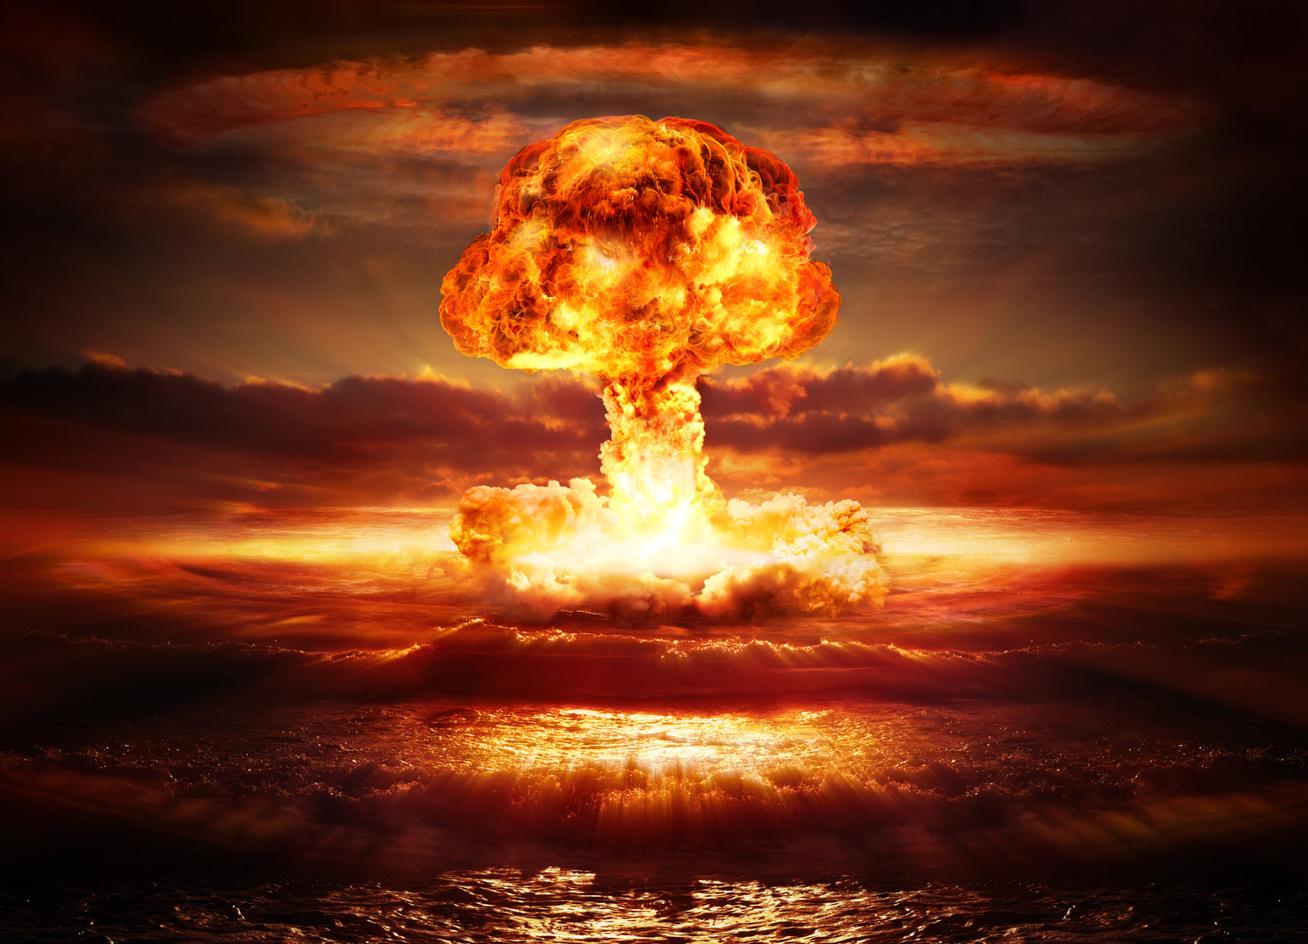 nagykep?cikkid=167510&kep=atombomba-lead-lead